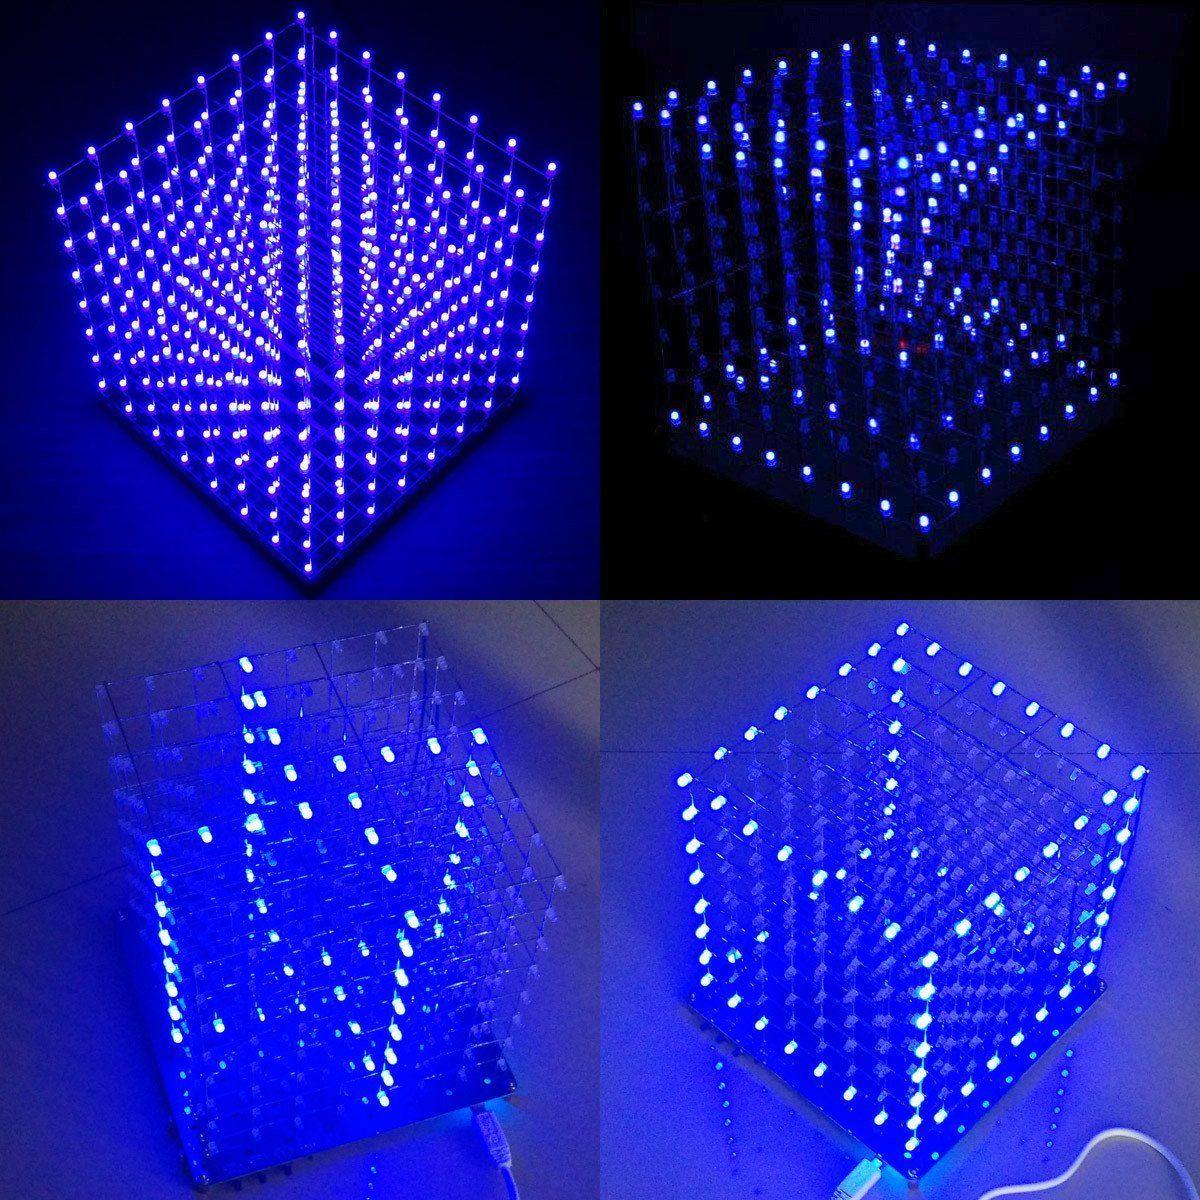 Arduino DIY 8x8x8 LED Cube 3D Light Square Electronic Soldering Sarter Kit Board (Blue Led